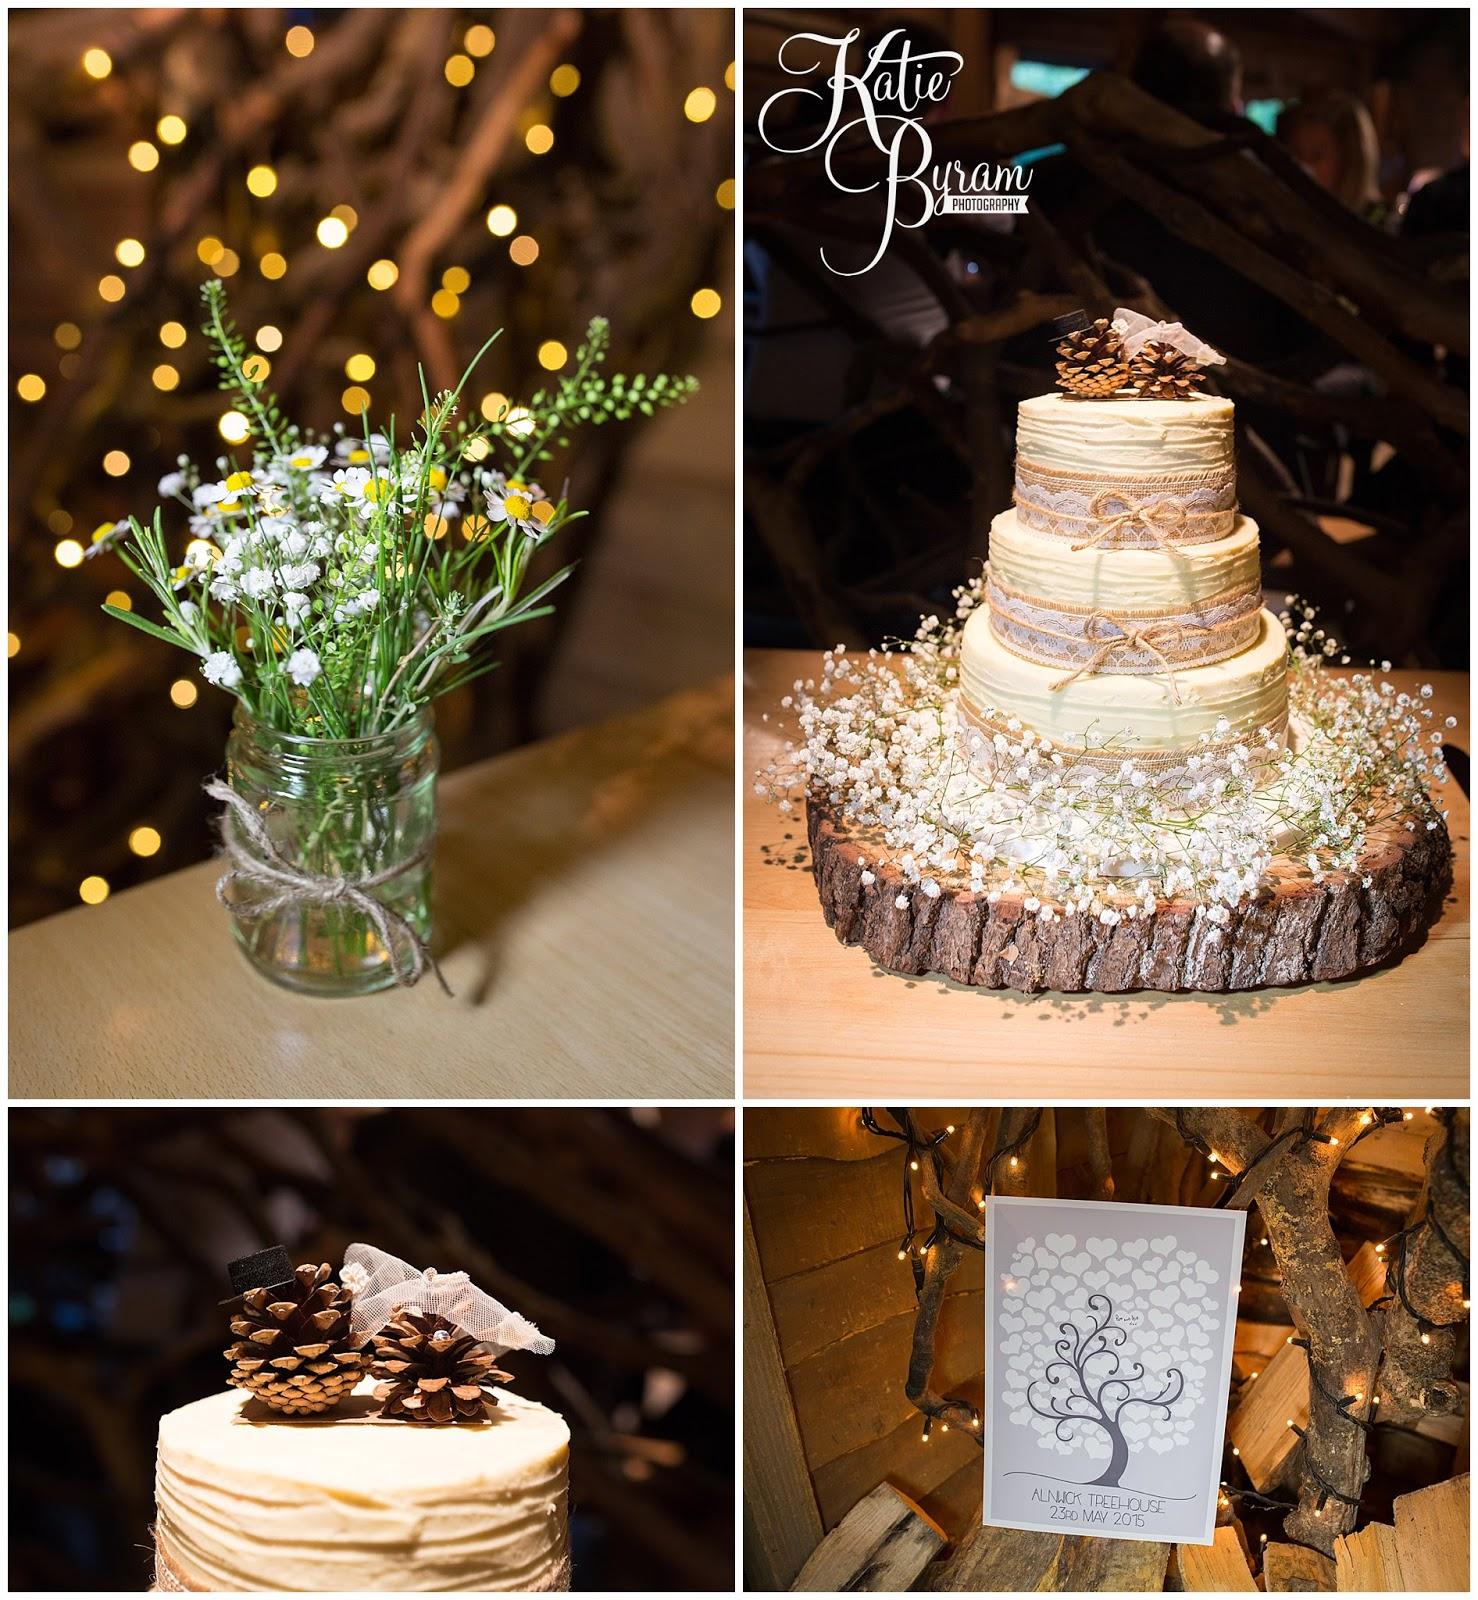 A Twinkly Woodland Themed Alnwick Treehouse Wedding: Lynne